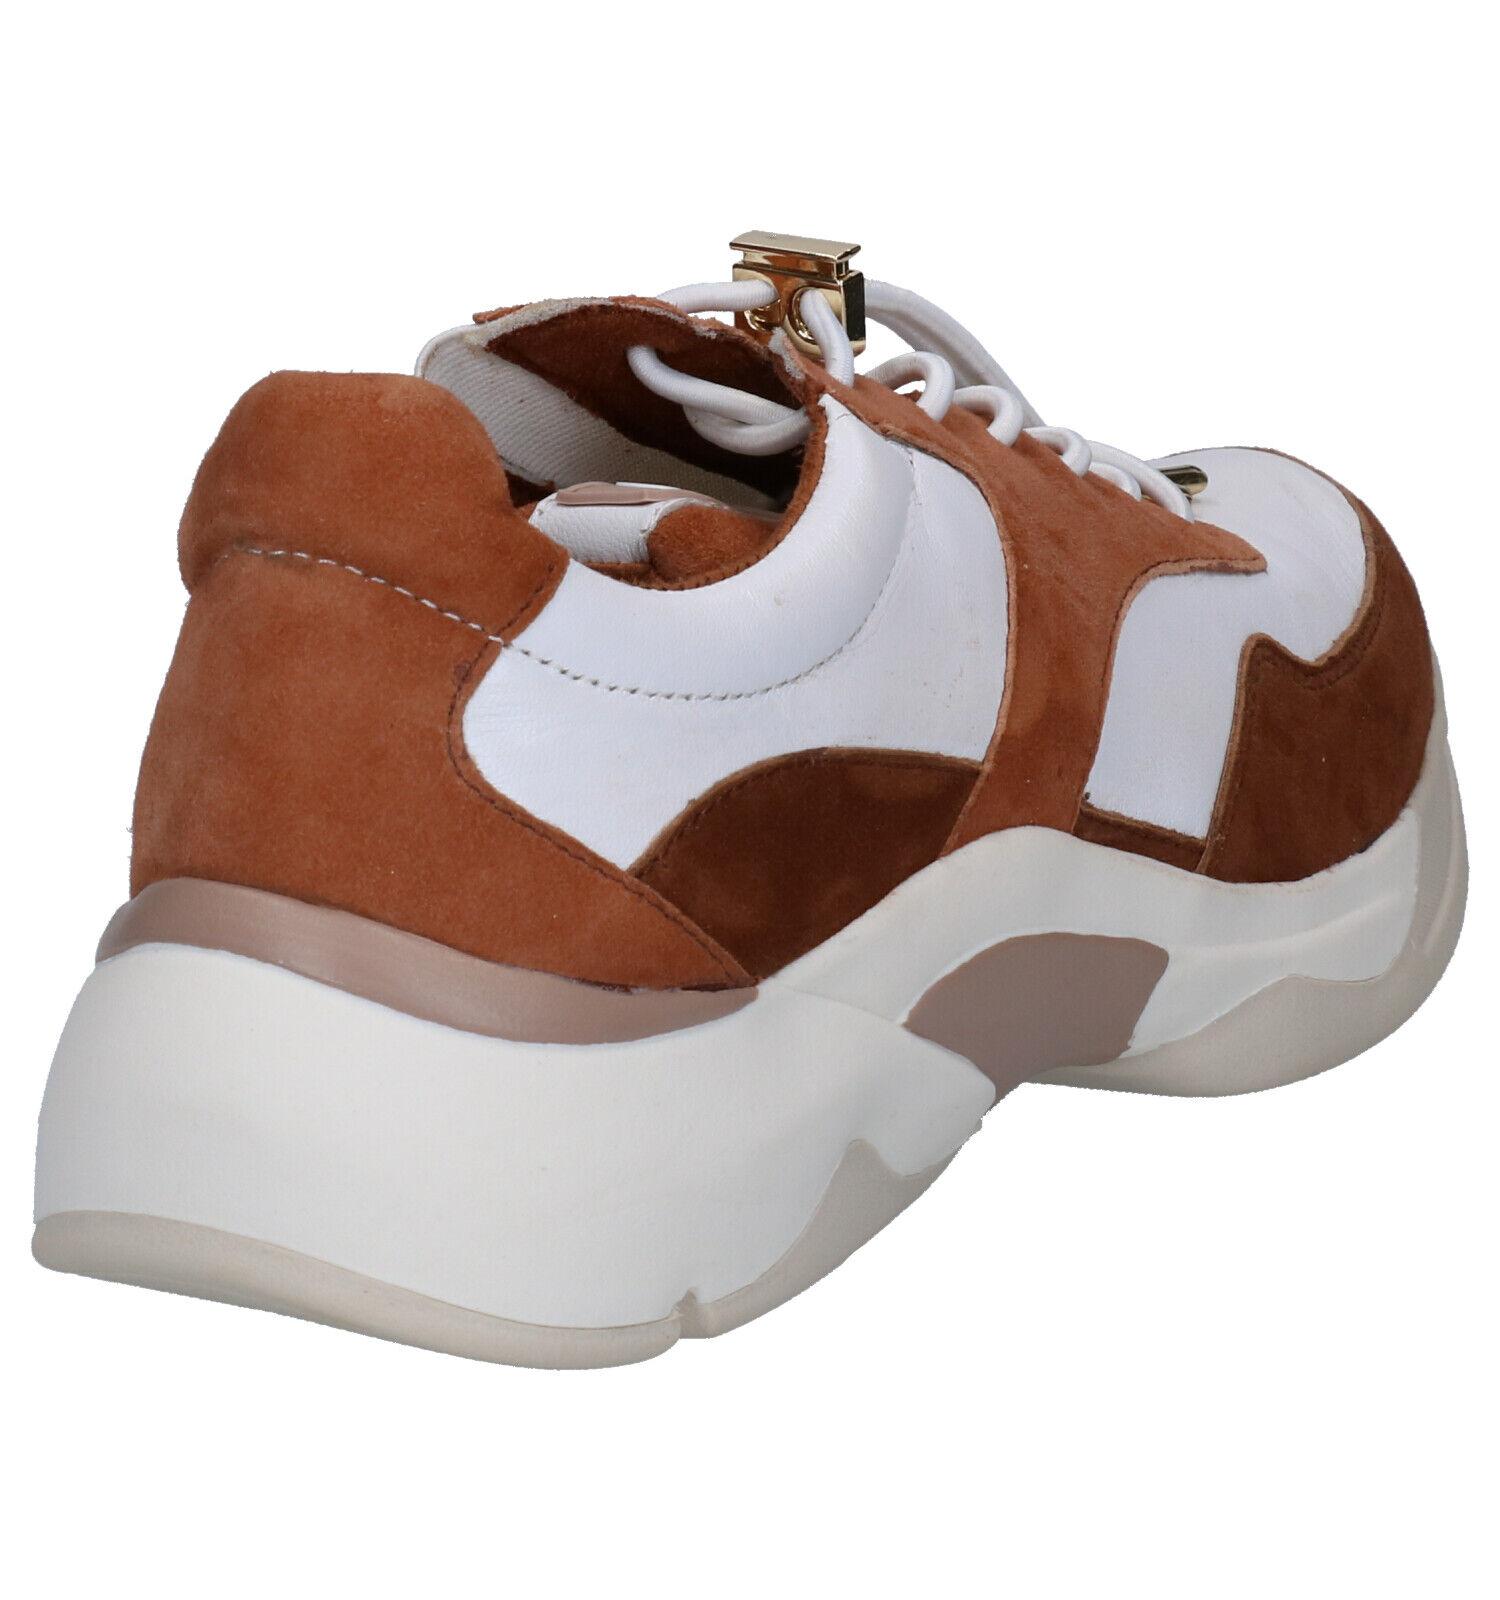 Tamaris Pure Relax Sneakers Wit/Cognac